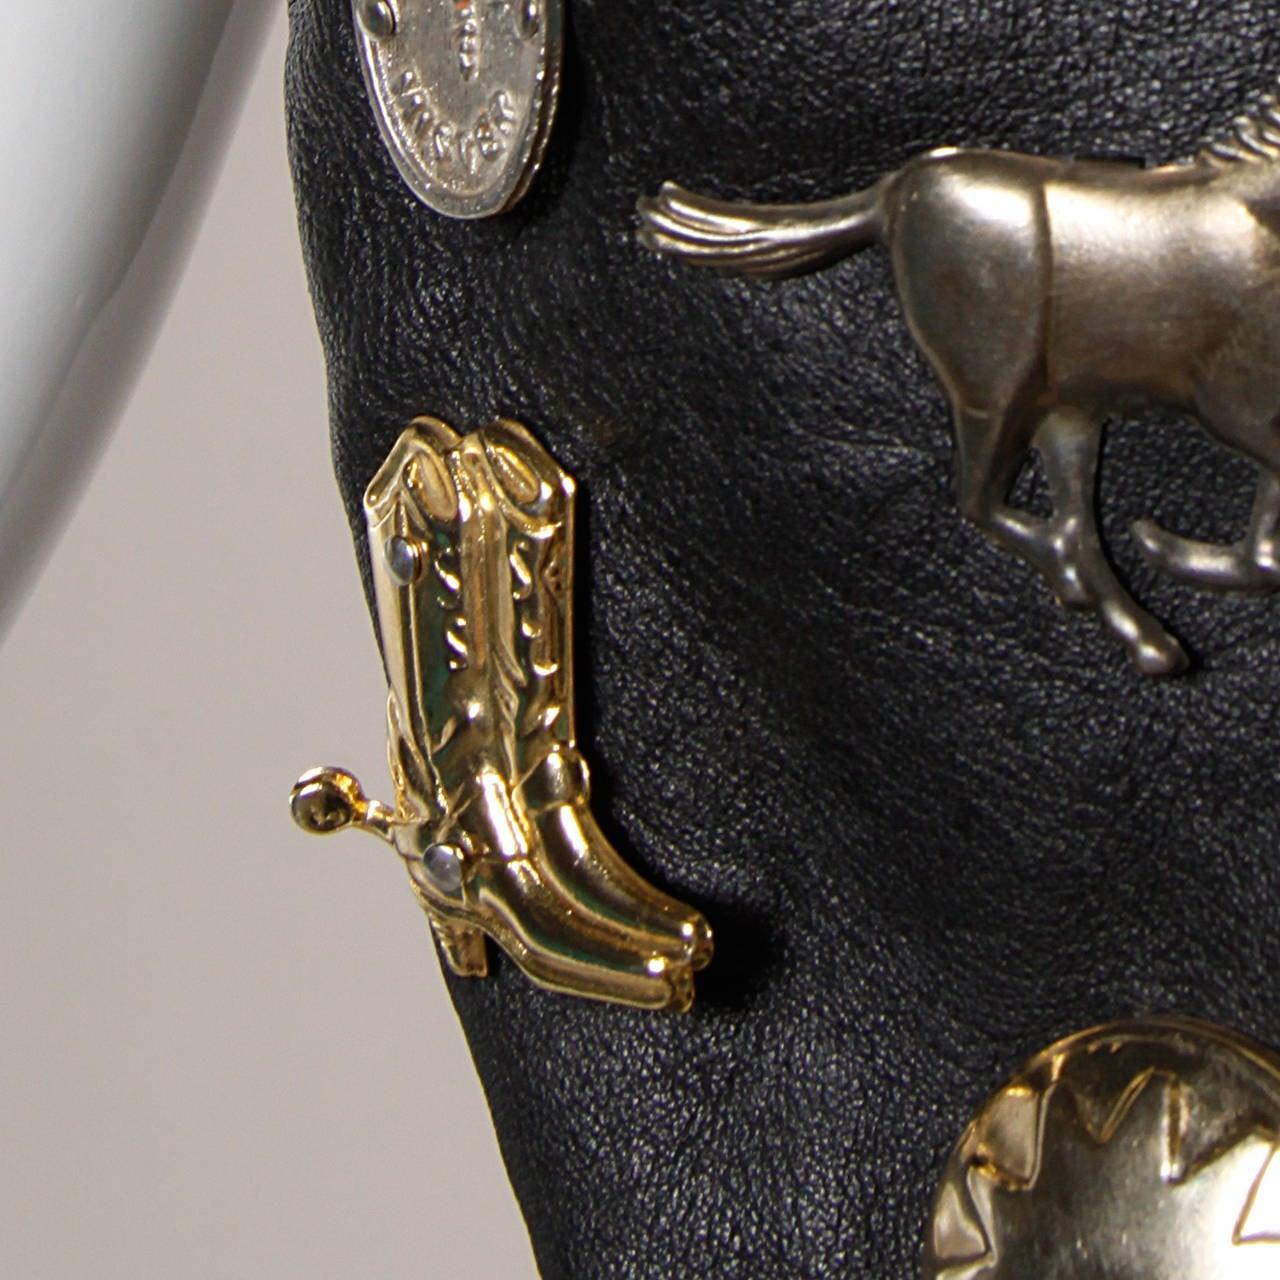 Vintage Leather Vest with Concho, Cowboy Boots, + Horse Studs 4